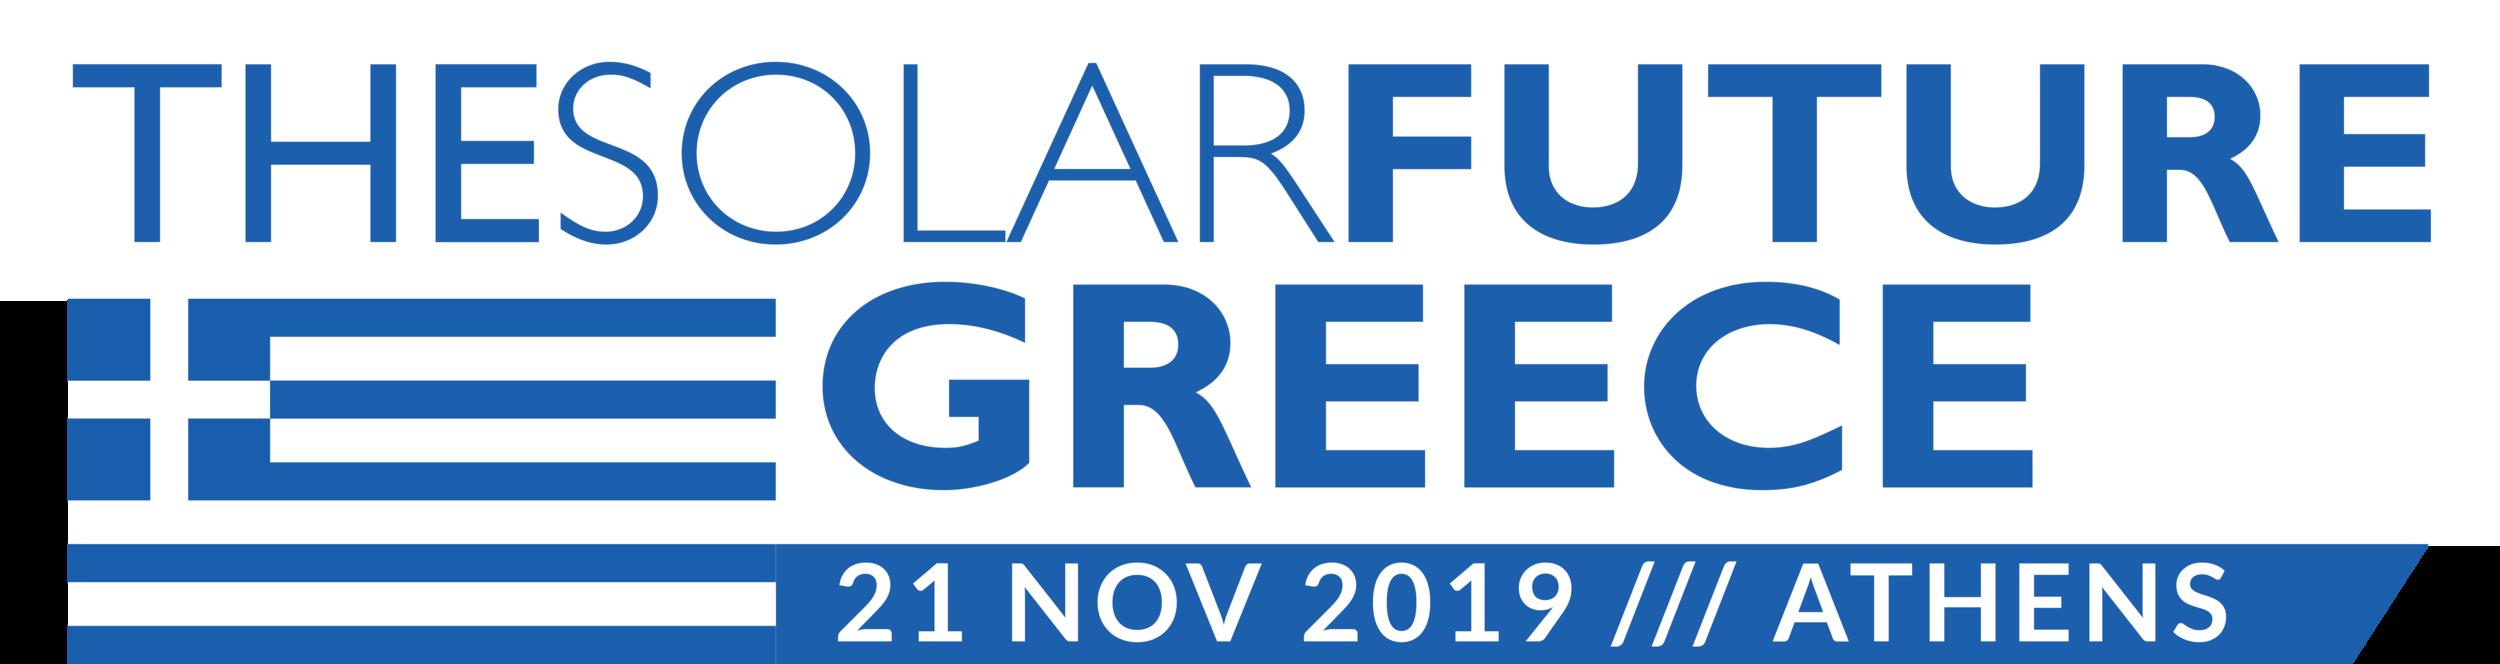 TSF Greece 2019 - Main Logo White (PNG) (300DPI).png